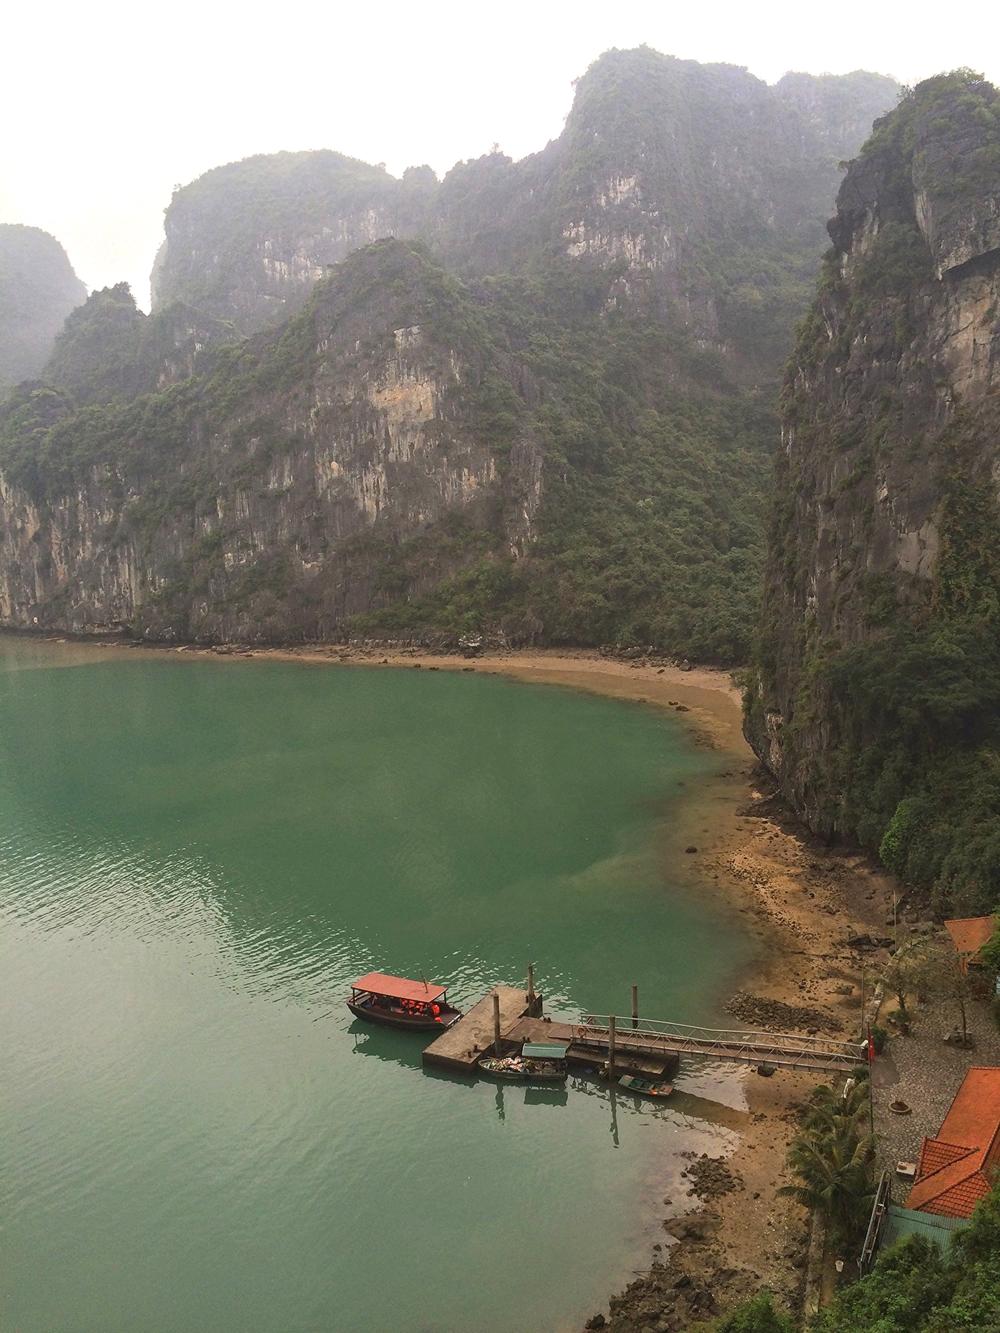 docks and rocks